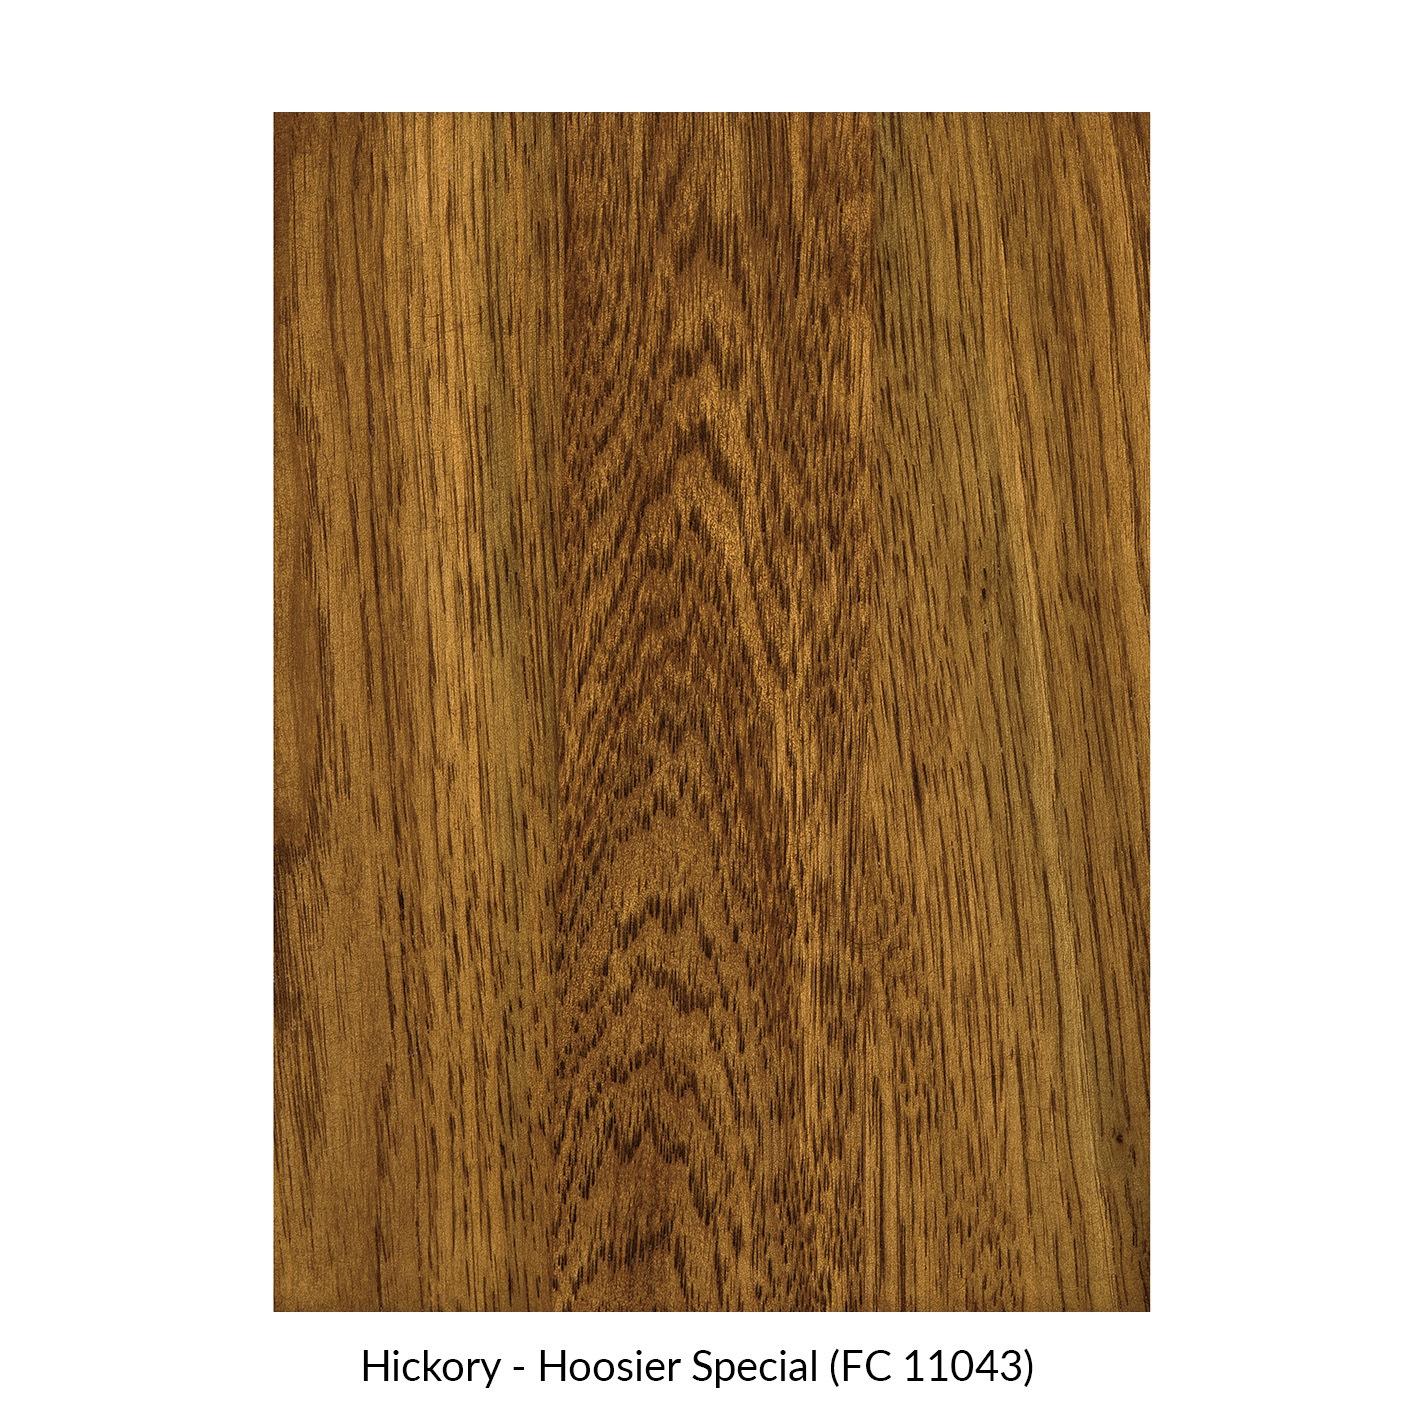 spectrum-hickory-hoosier-special-fc-11043.jpg